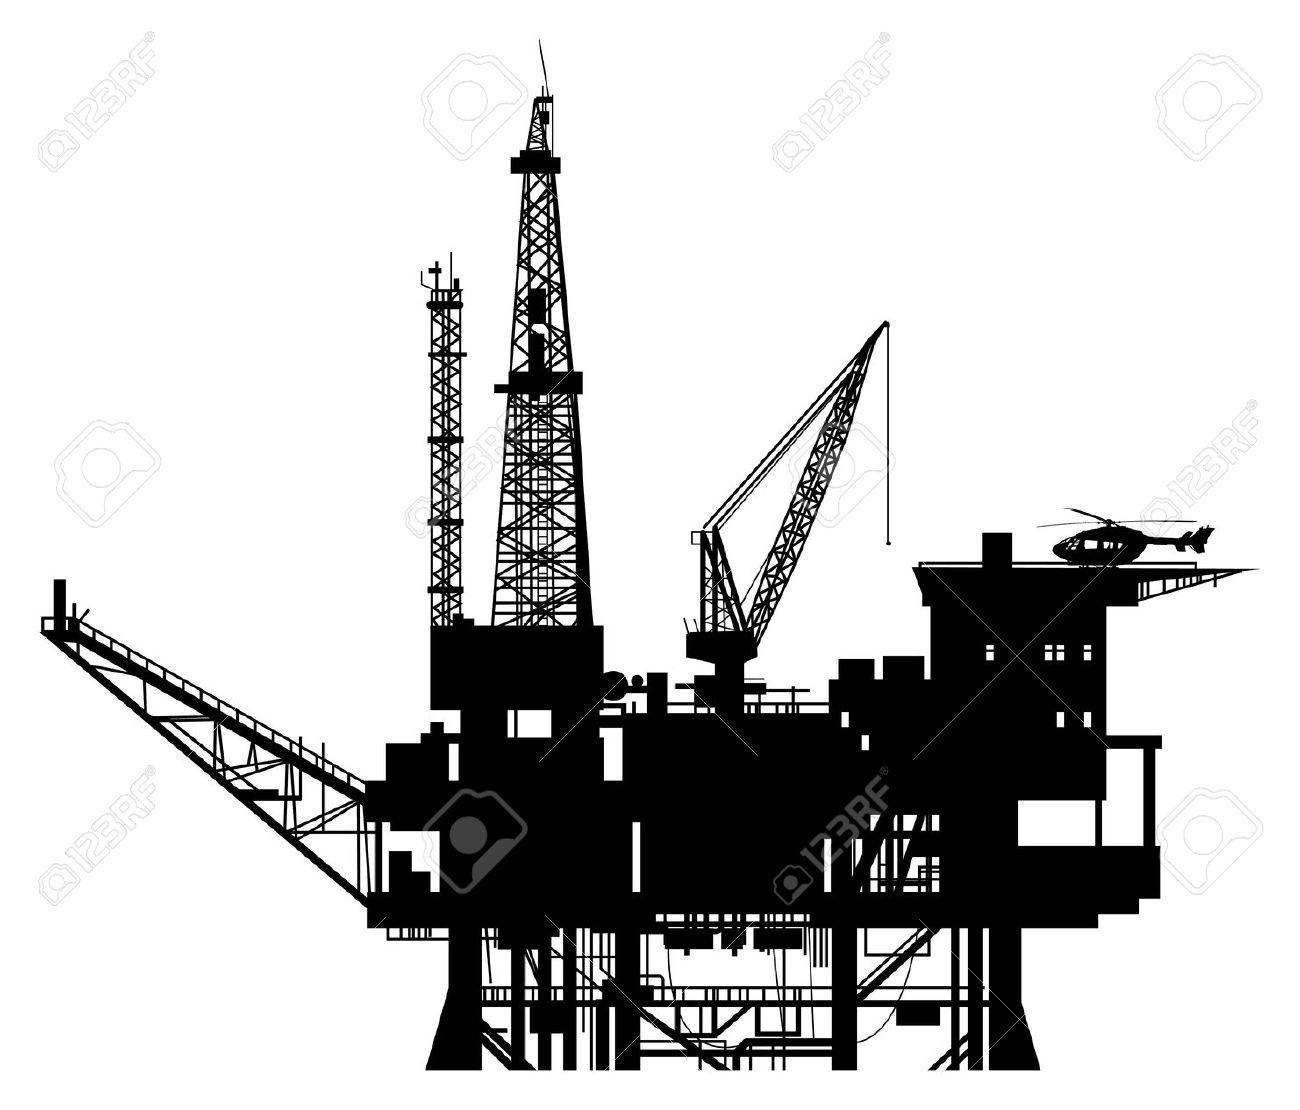 Oil rig images clipart vector transparent download 6+ Oil Rig Clipart | ClipartLook vector transparent download